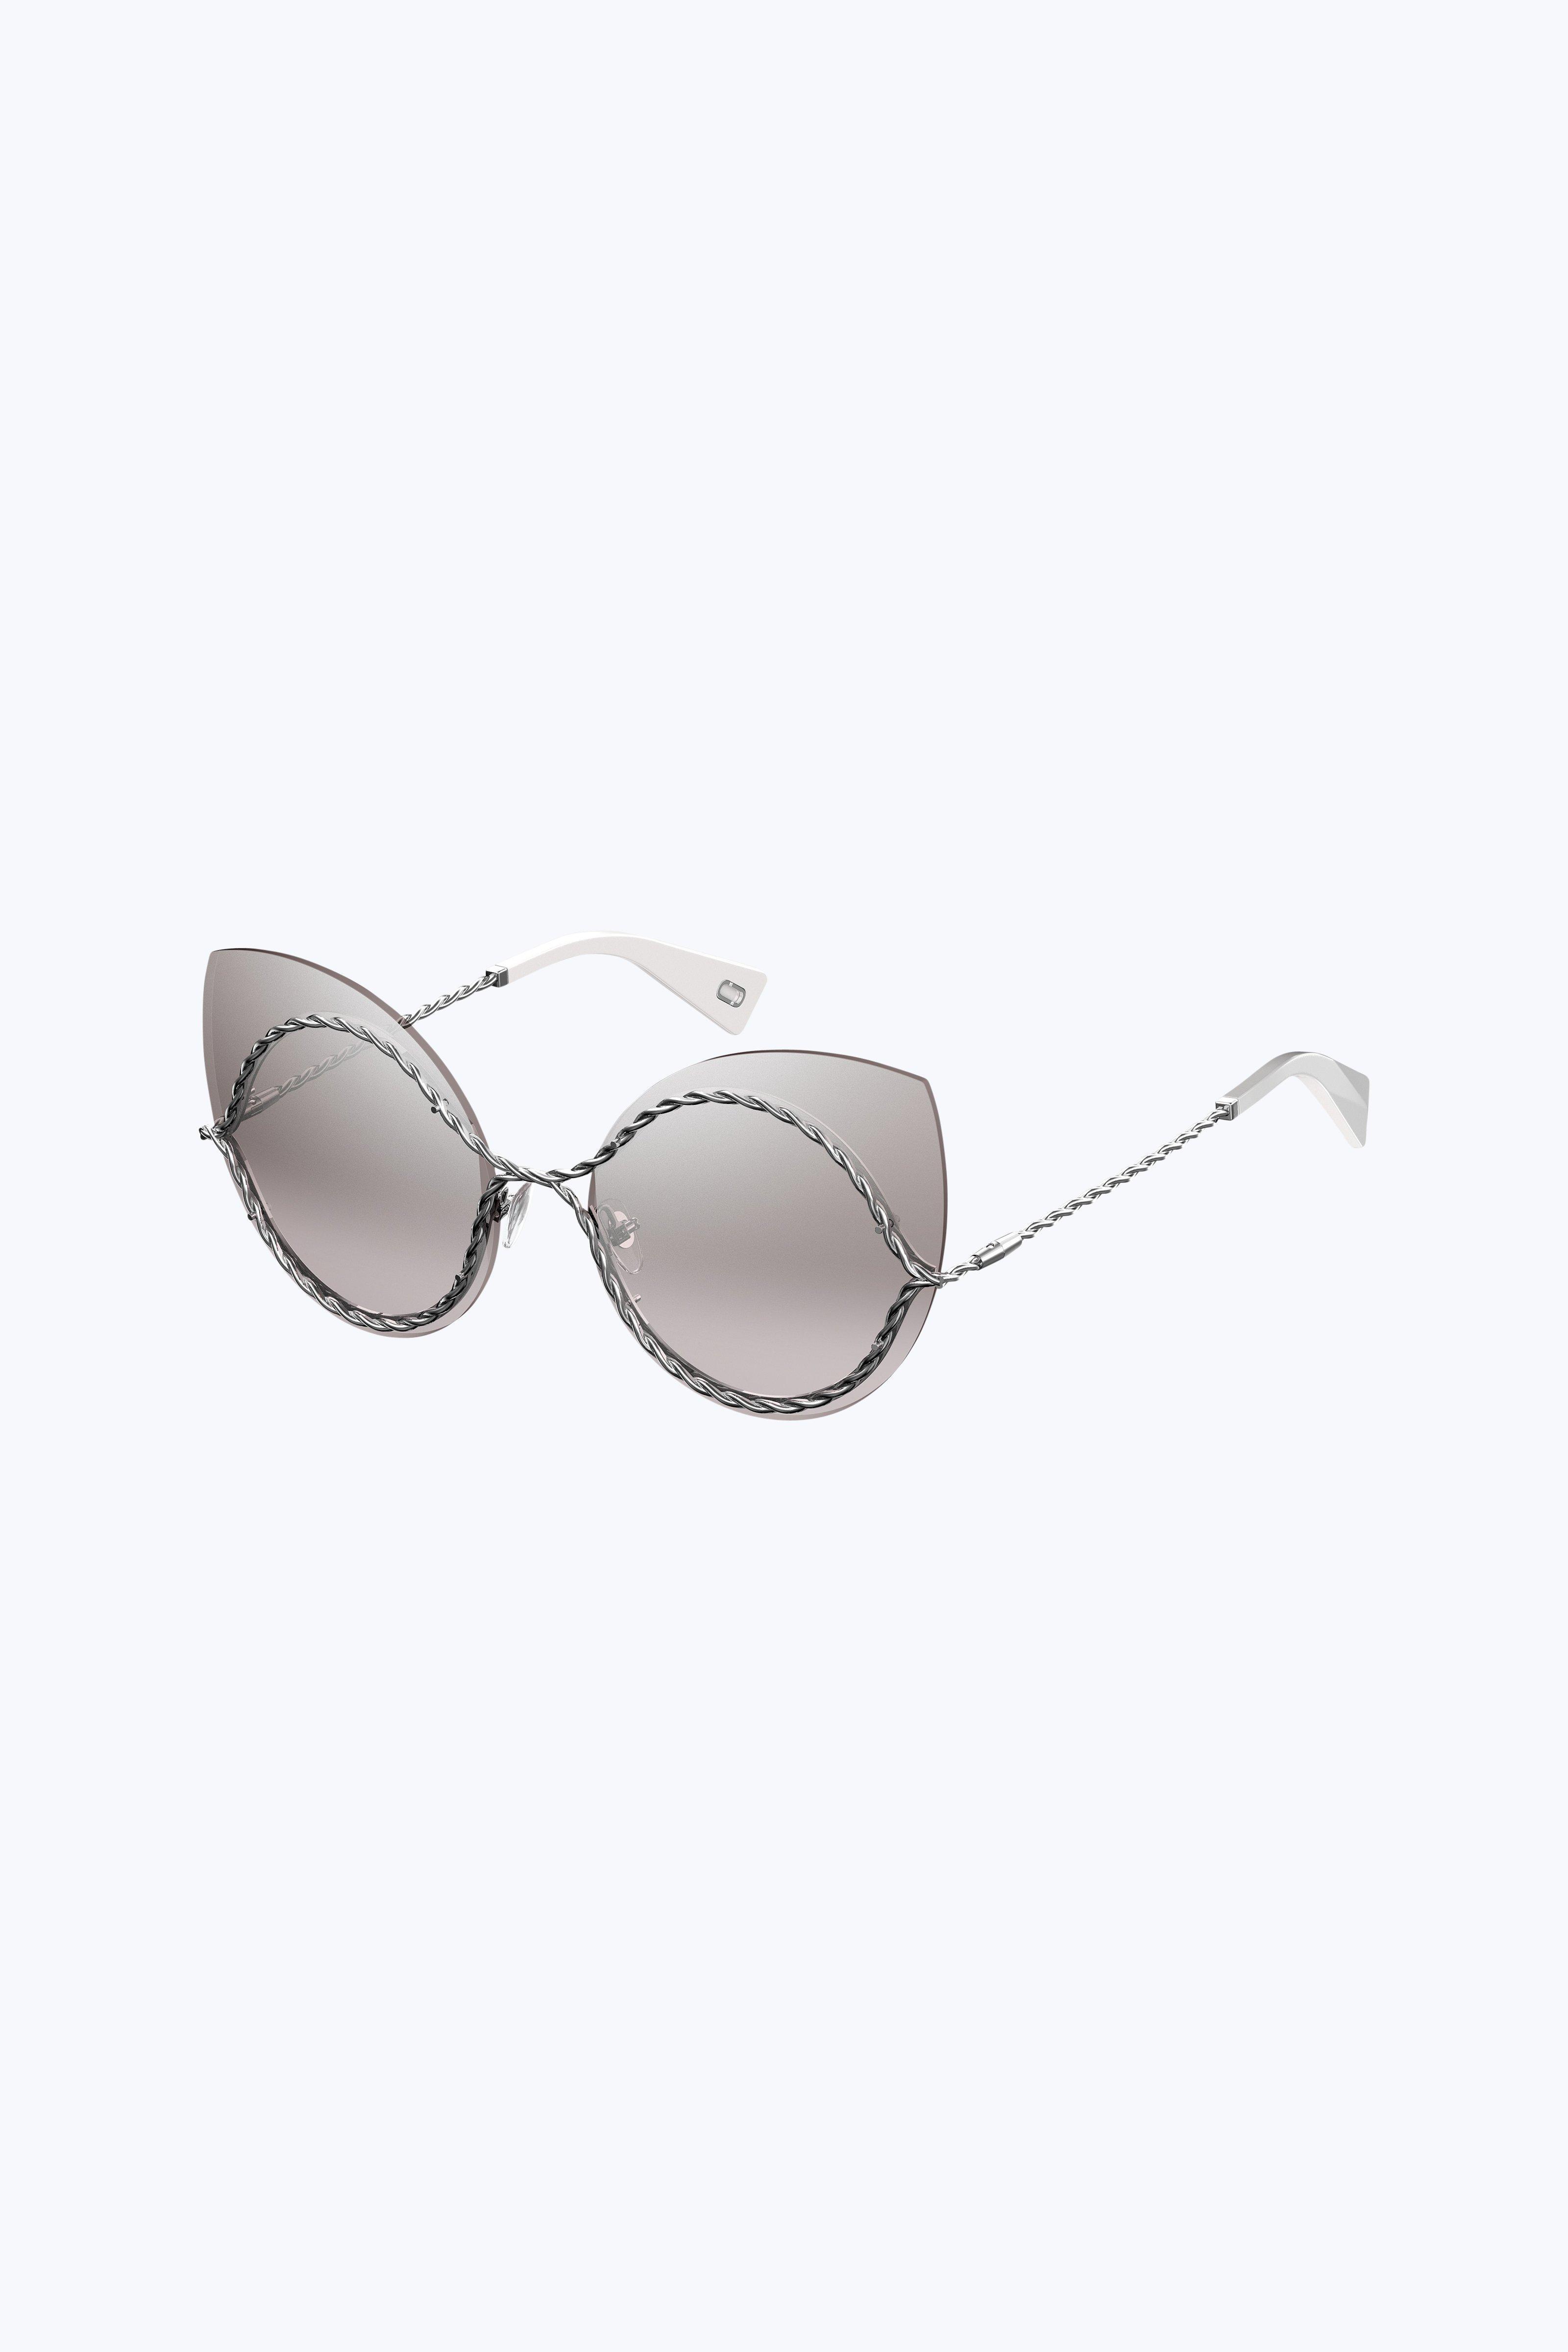 gladiator sunglasses i5oo avanti house school. Black Bedroom Furniture Sets. Home Design Ideas